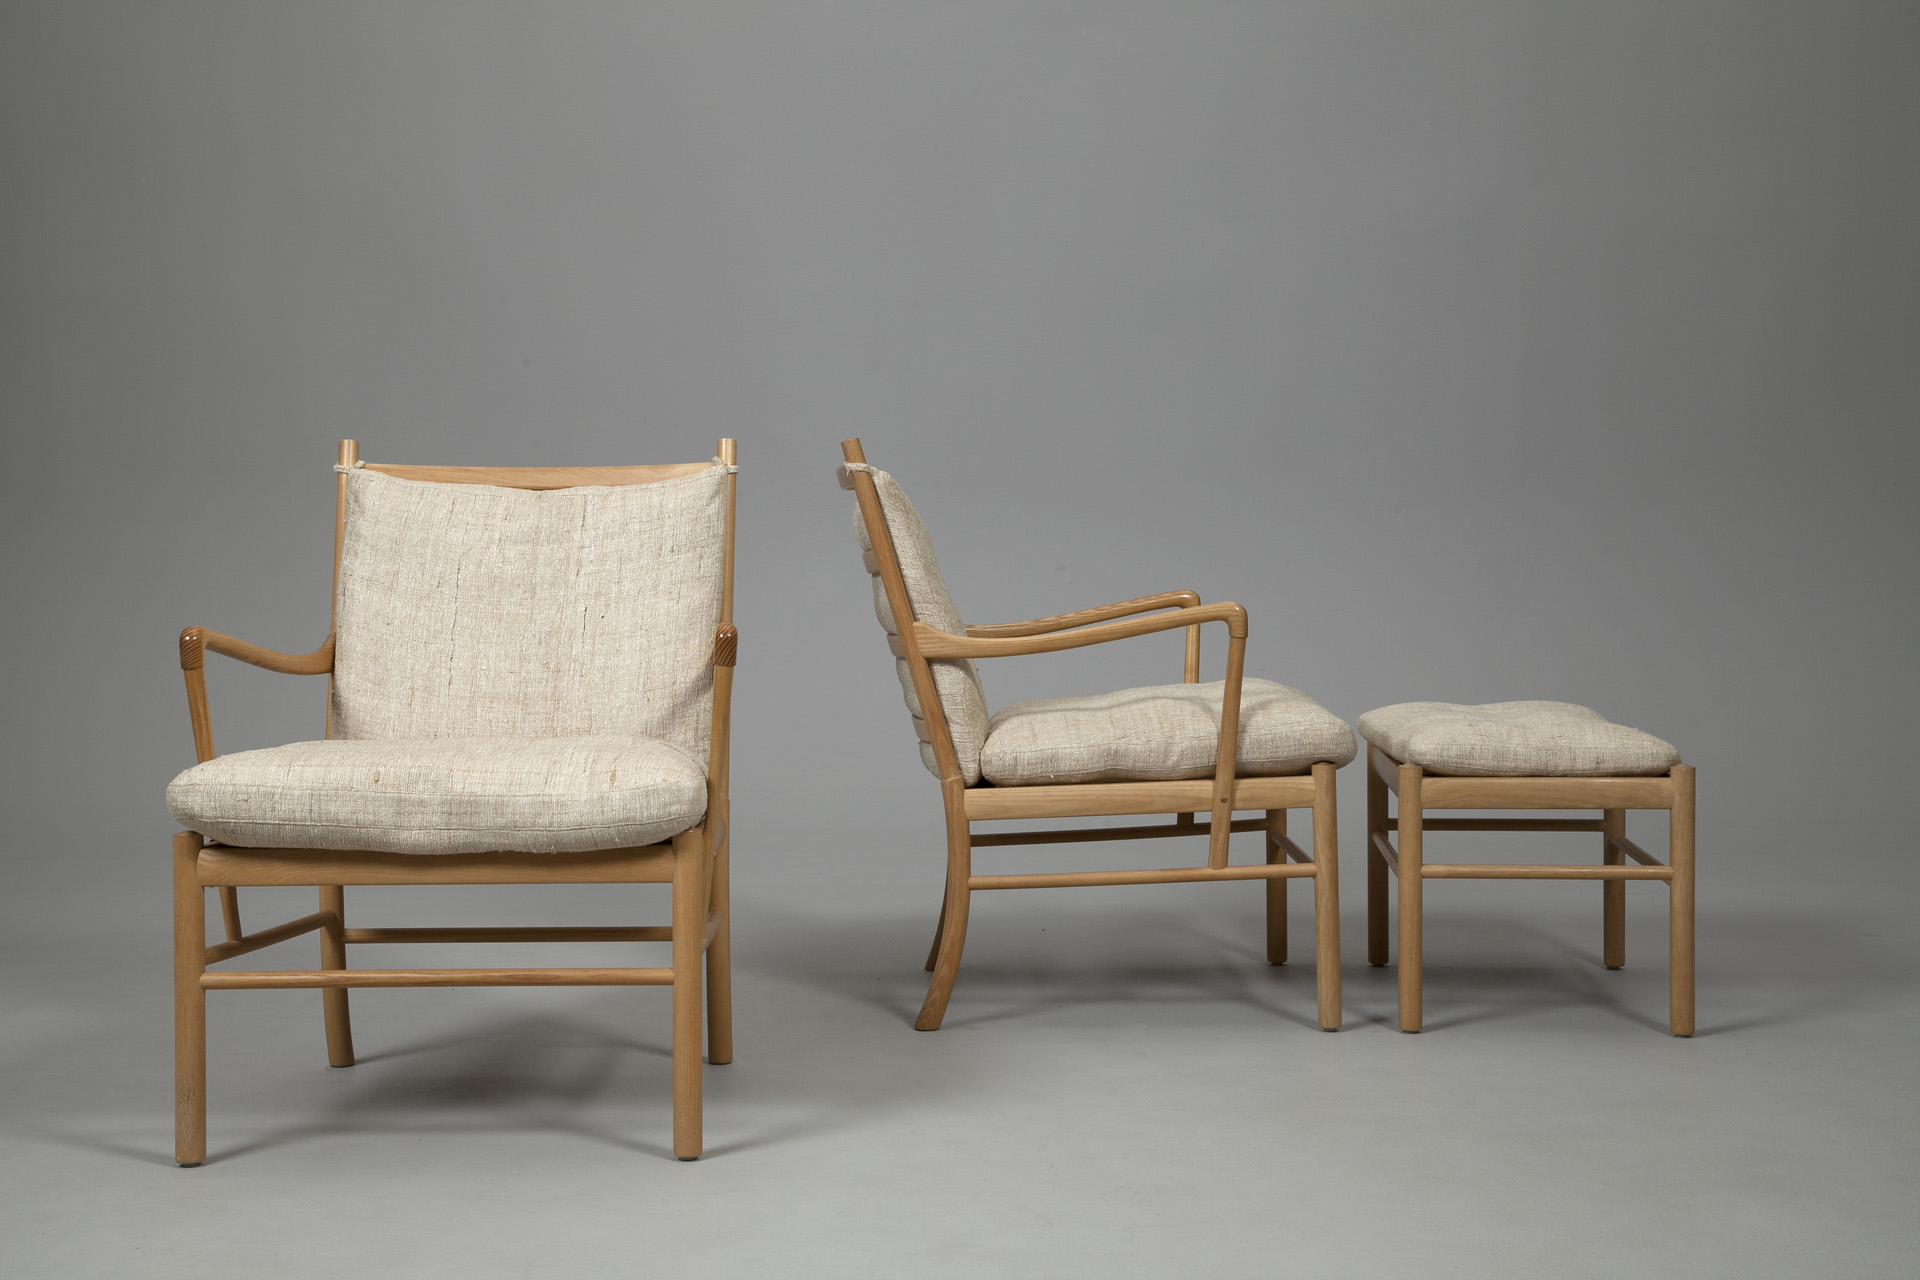 ethan allen furniture orlando florida trend home design